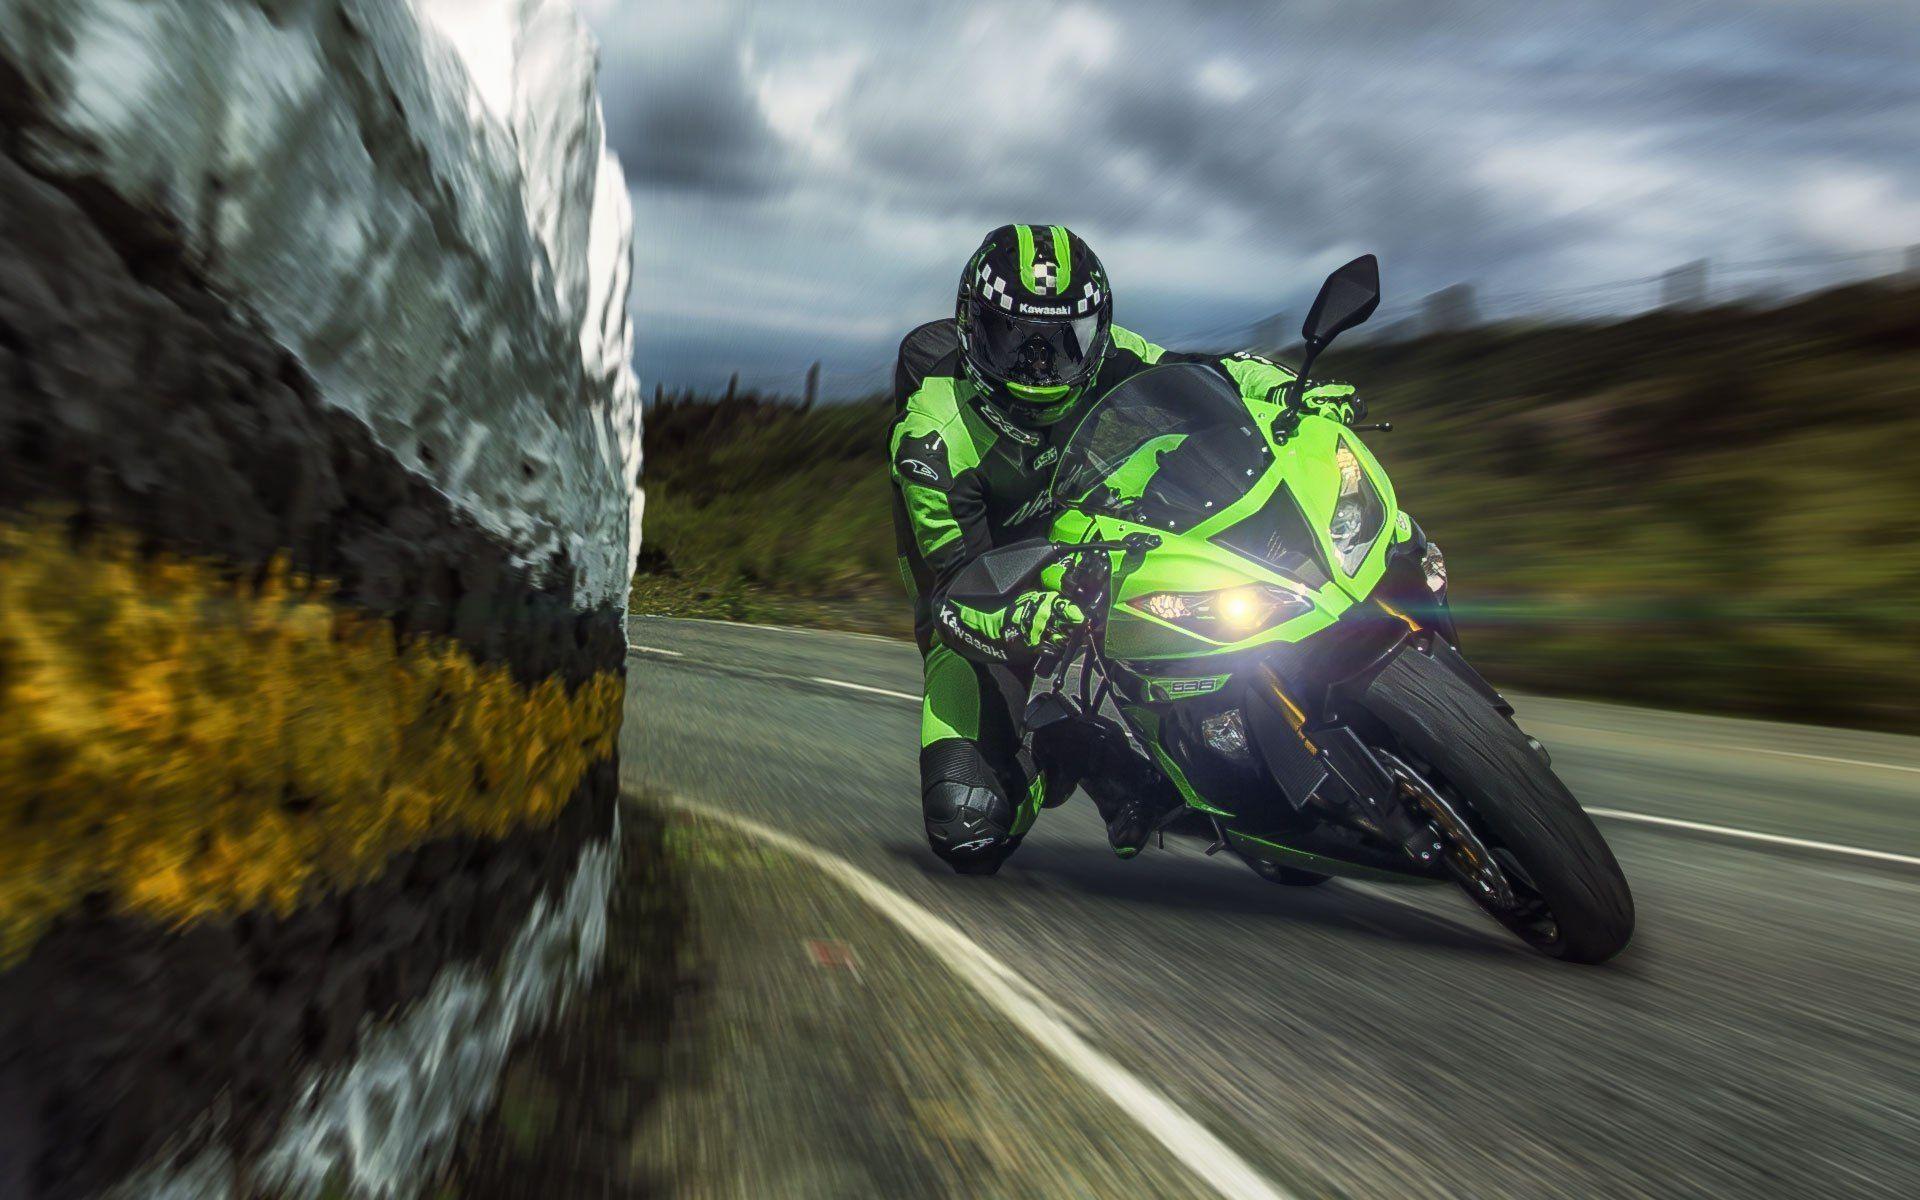 Kawasaki Ninja 300 HD Wallpaper – Free Download Wallpaper from .